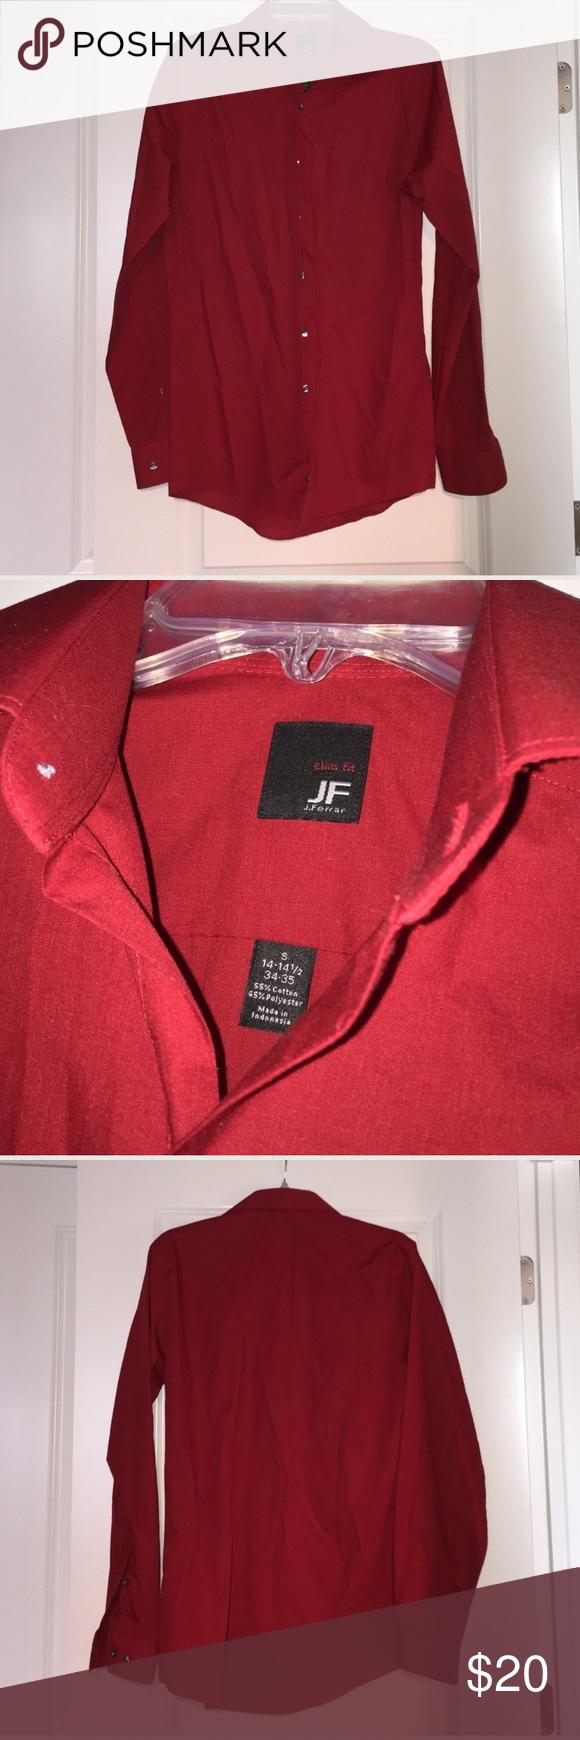 TWO men's button down shirts - Puritan, J.Ferrar TWO men's button down shirts! EUC Men's Puritan plaid dress shirt size S 34-36 and EUC Men's J.Ferrar red dress shirt size S 14-14.5 Slim Fit. NO wear or damage! Comes from a smoke free home, ships in one business day, thank you! jf j.ferrar Shirts Casual Button Down Shirts